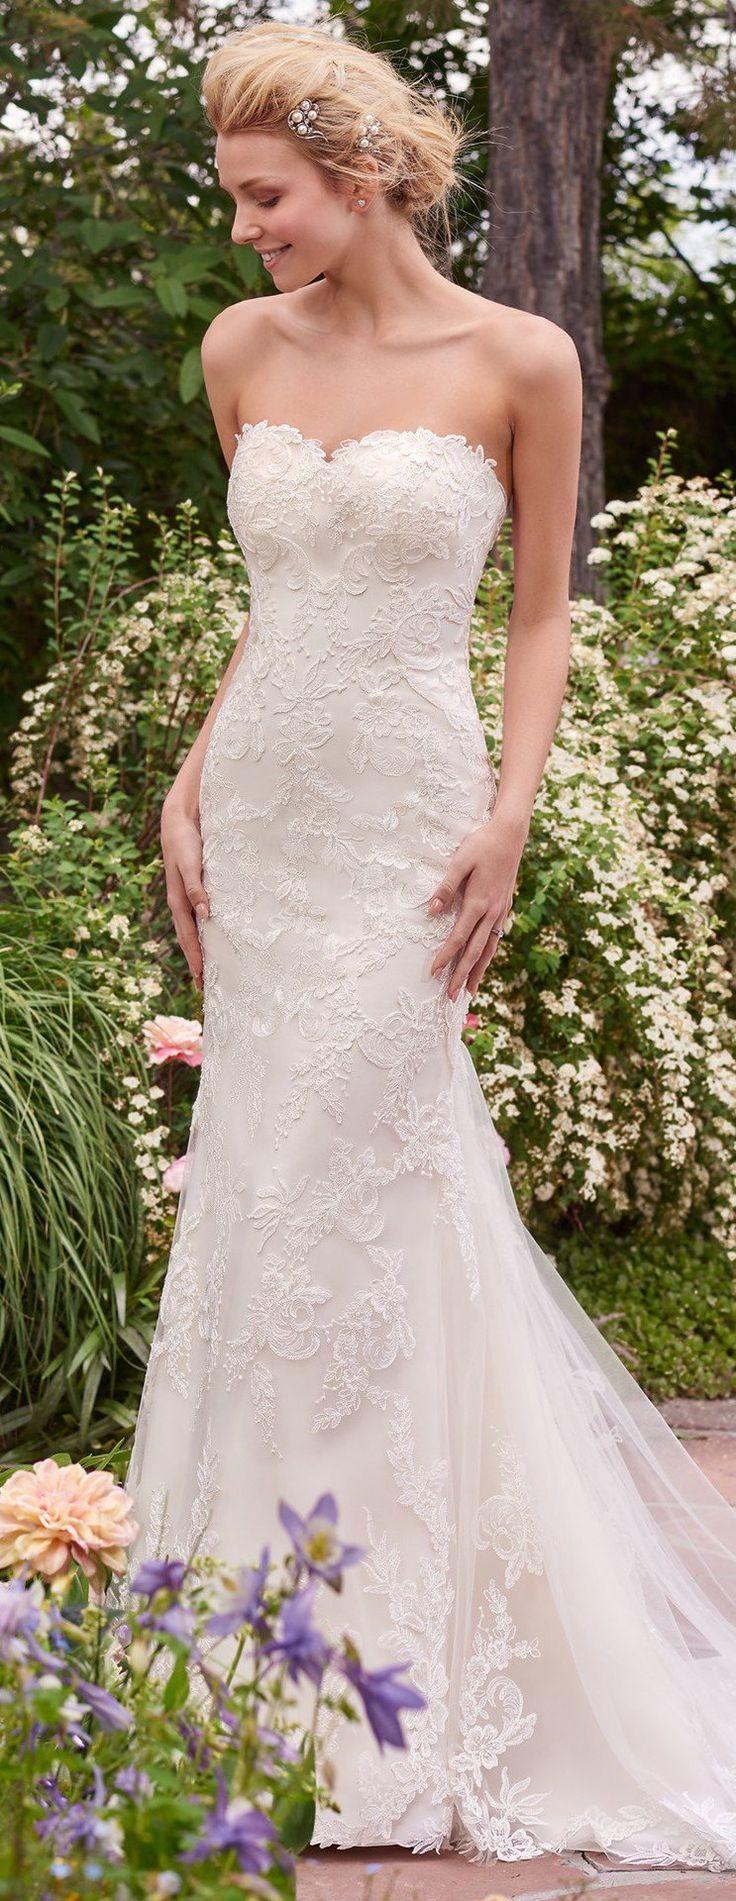 Wedding Dress by Rebecca Ingram - Sandra | Less than $1,000 | #rebeccaingram #rebeccabride